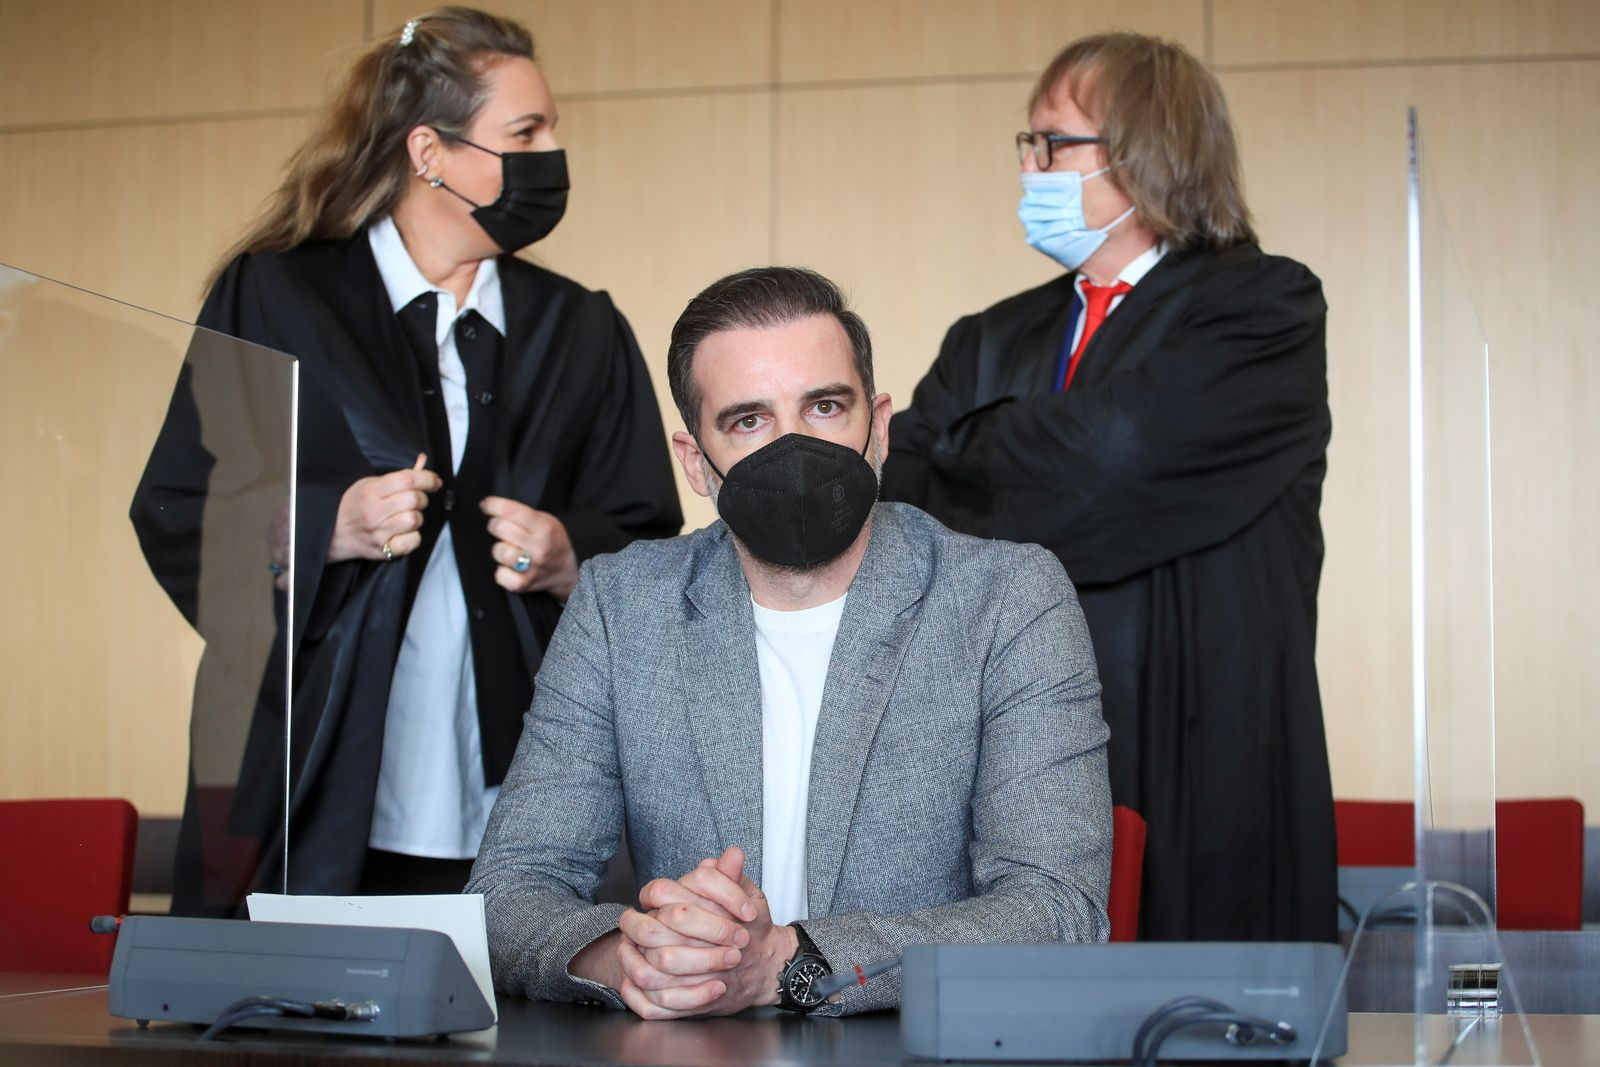 Trial against former soccer player Metzelder in Duessledorf